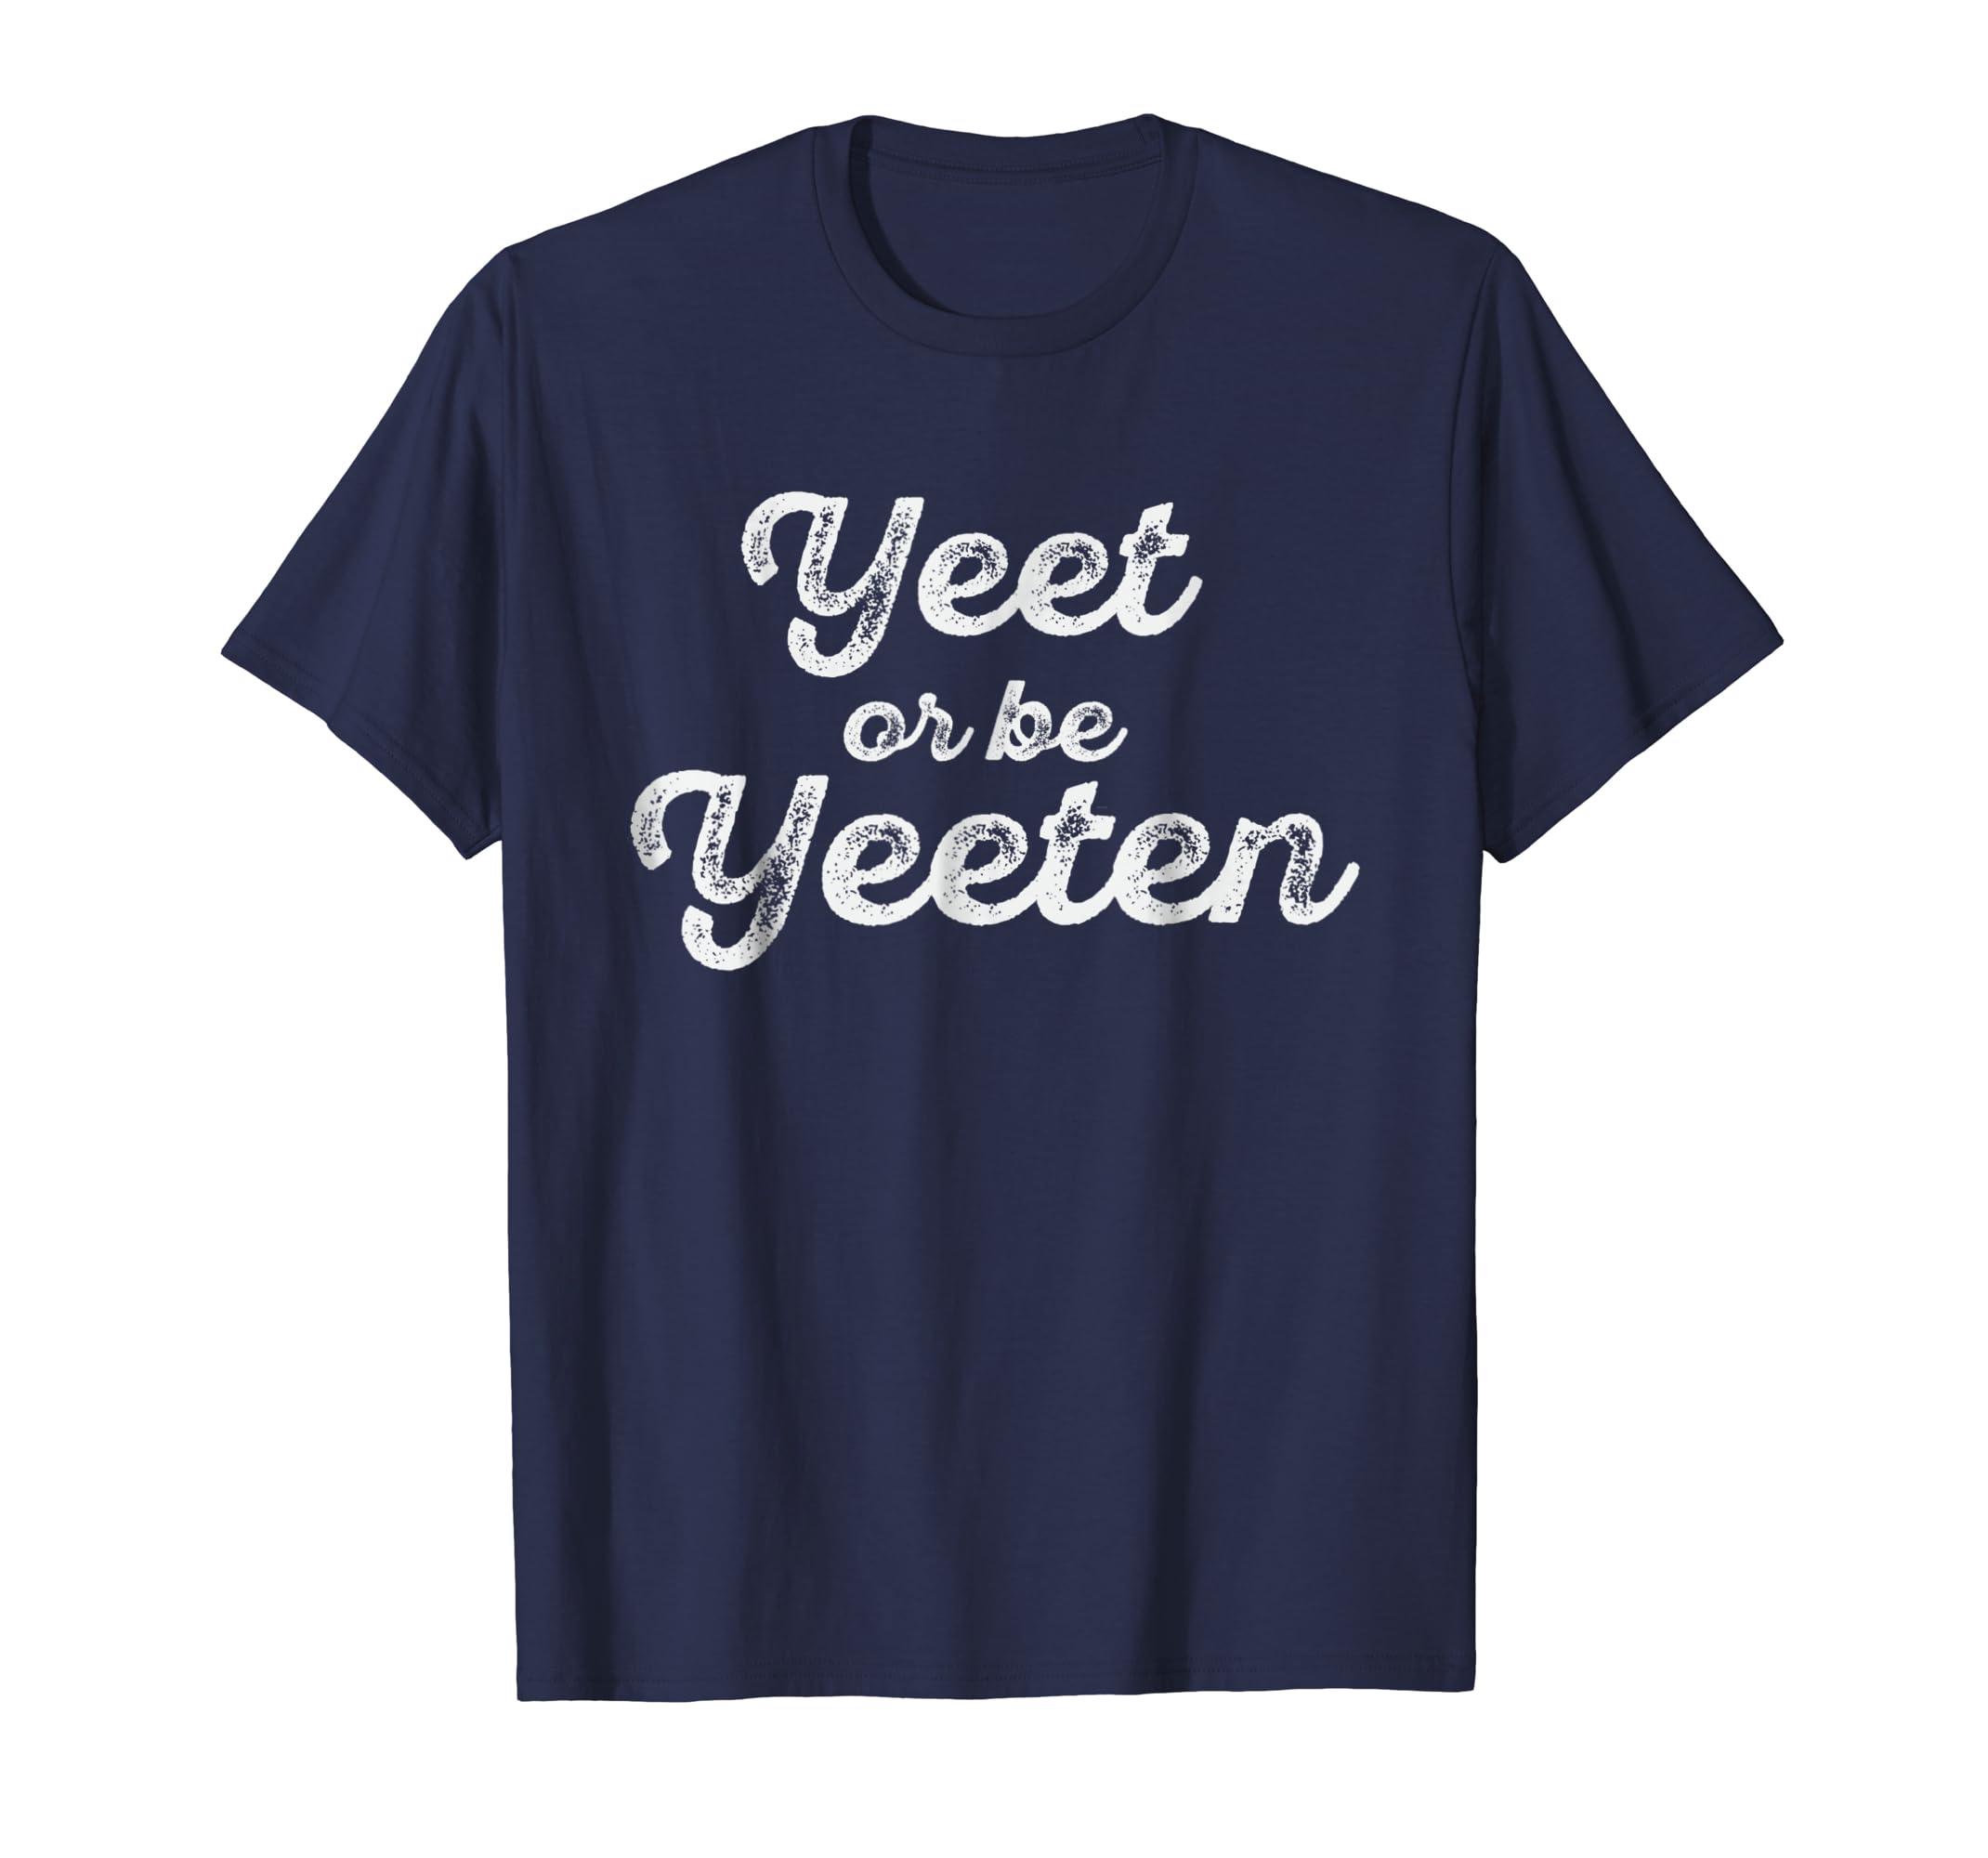 Yeet or be yeeten T-shirt Meme Swag or Gift-Yolotee